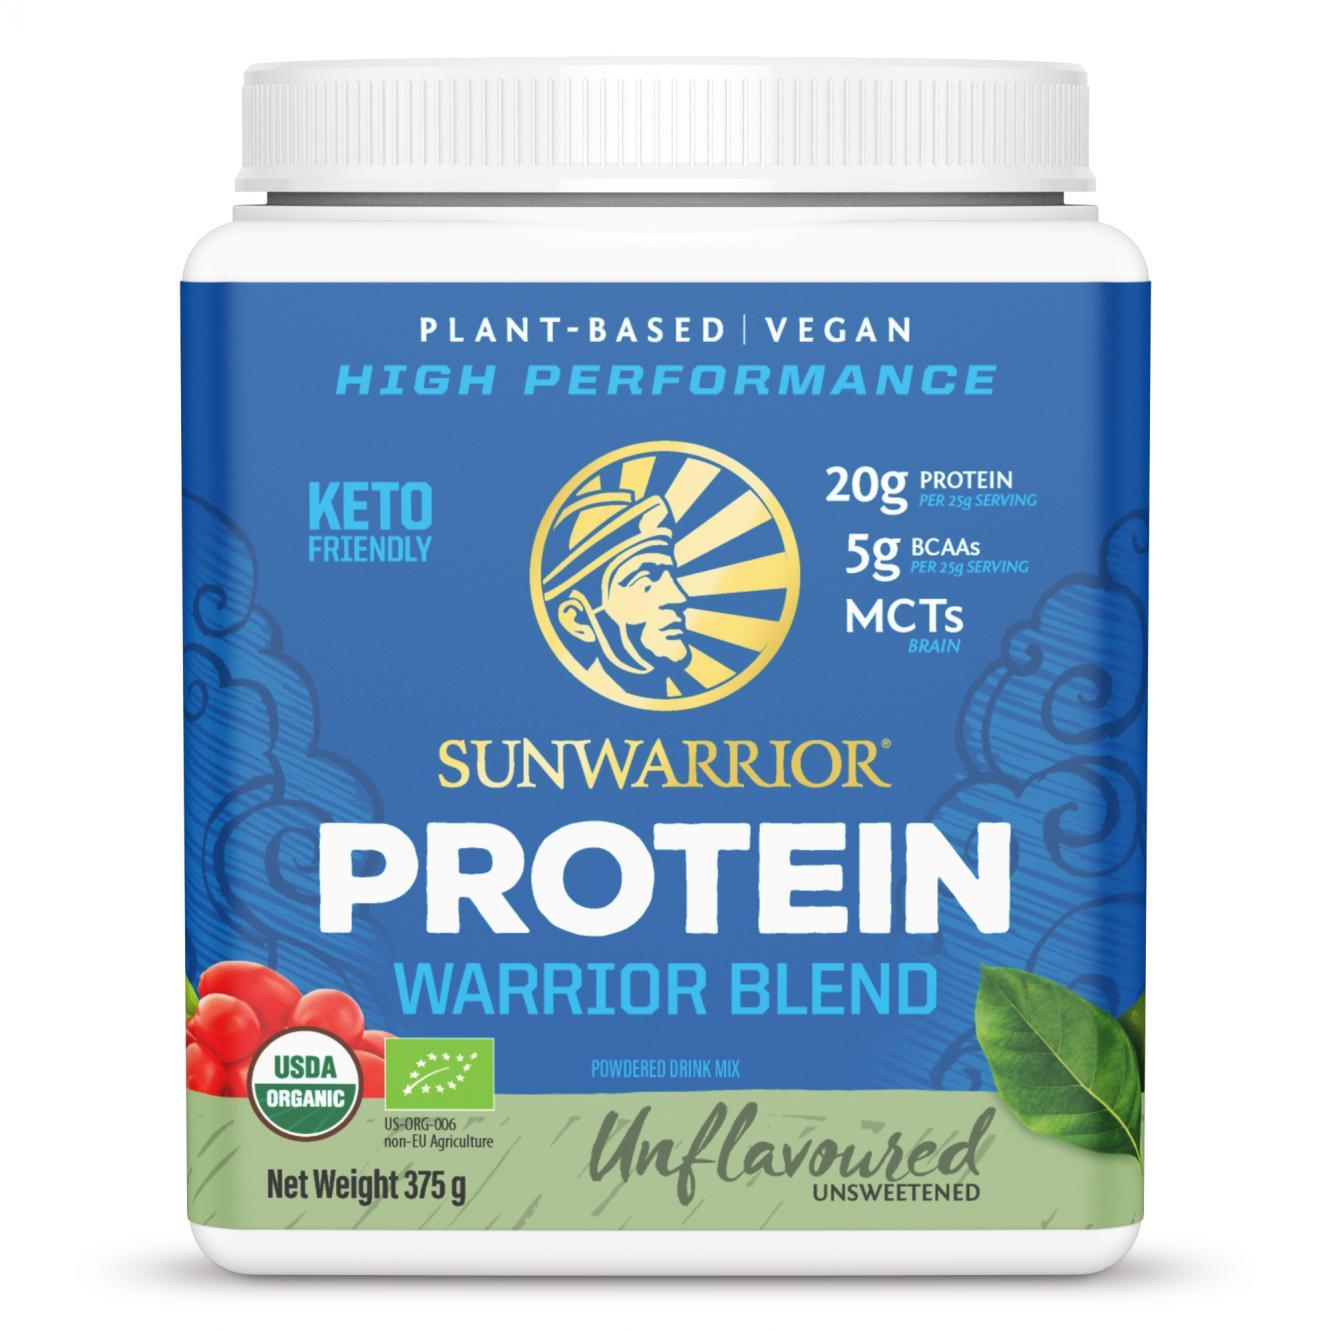 Protein Warrior Blend Natural 375g (Blue Tub)